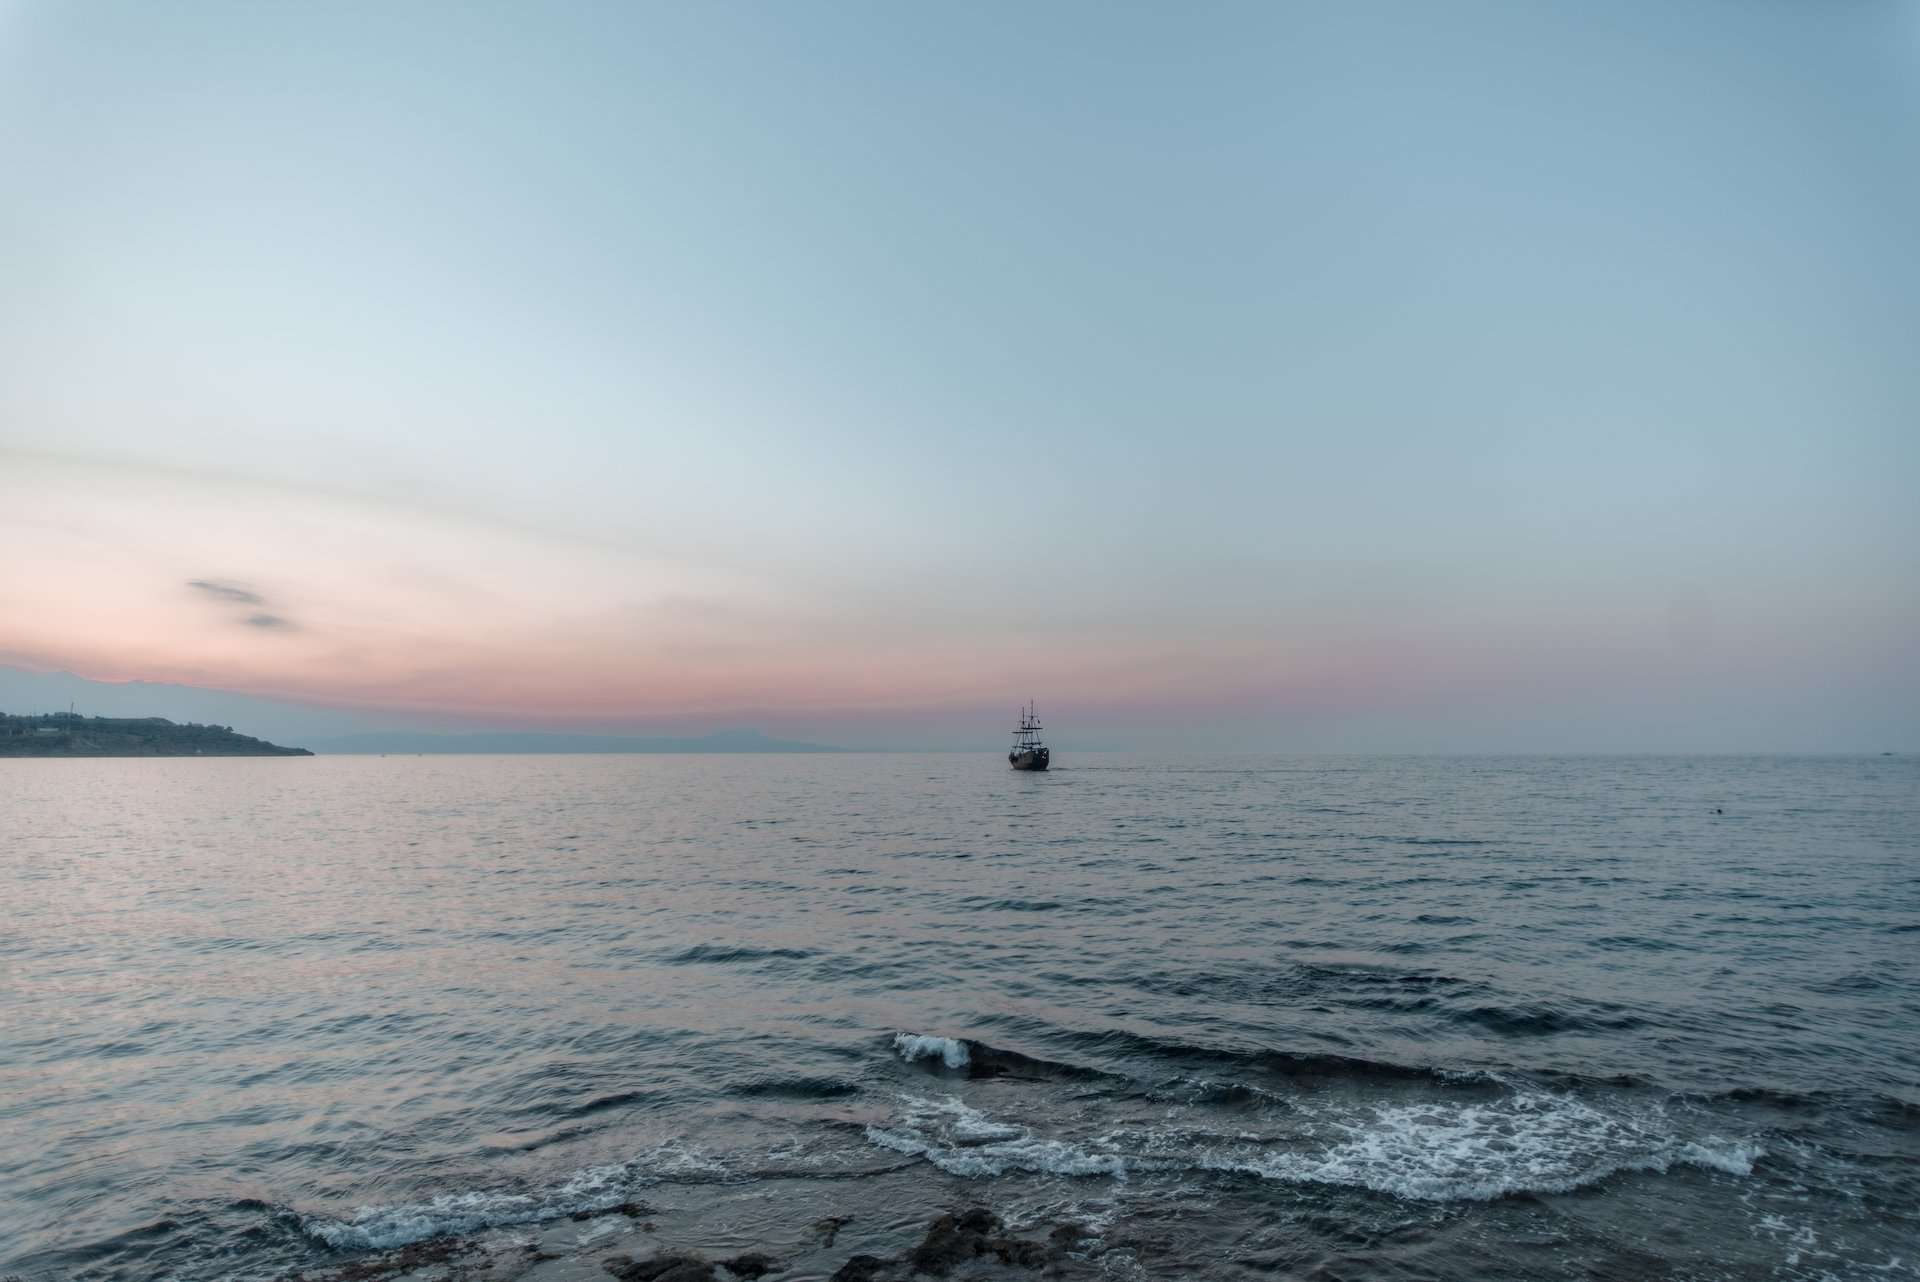 Rethymno, Crete sunset